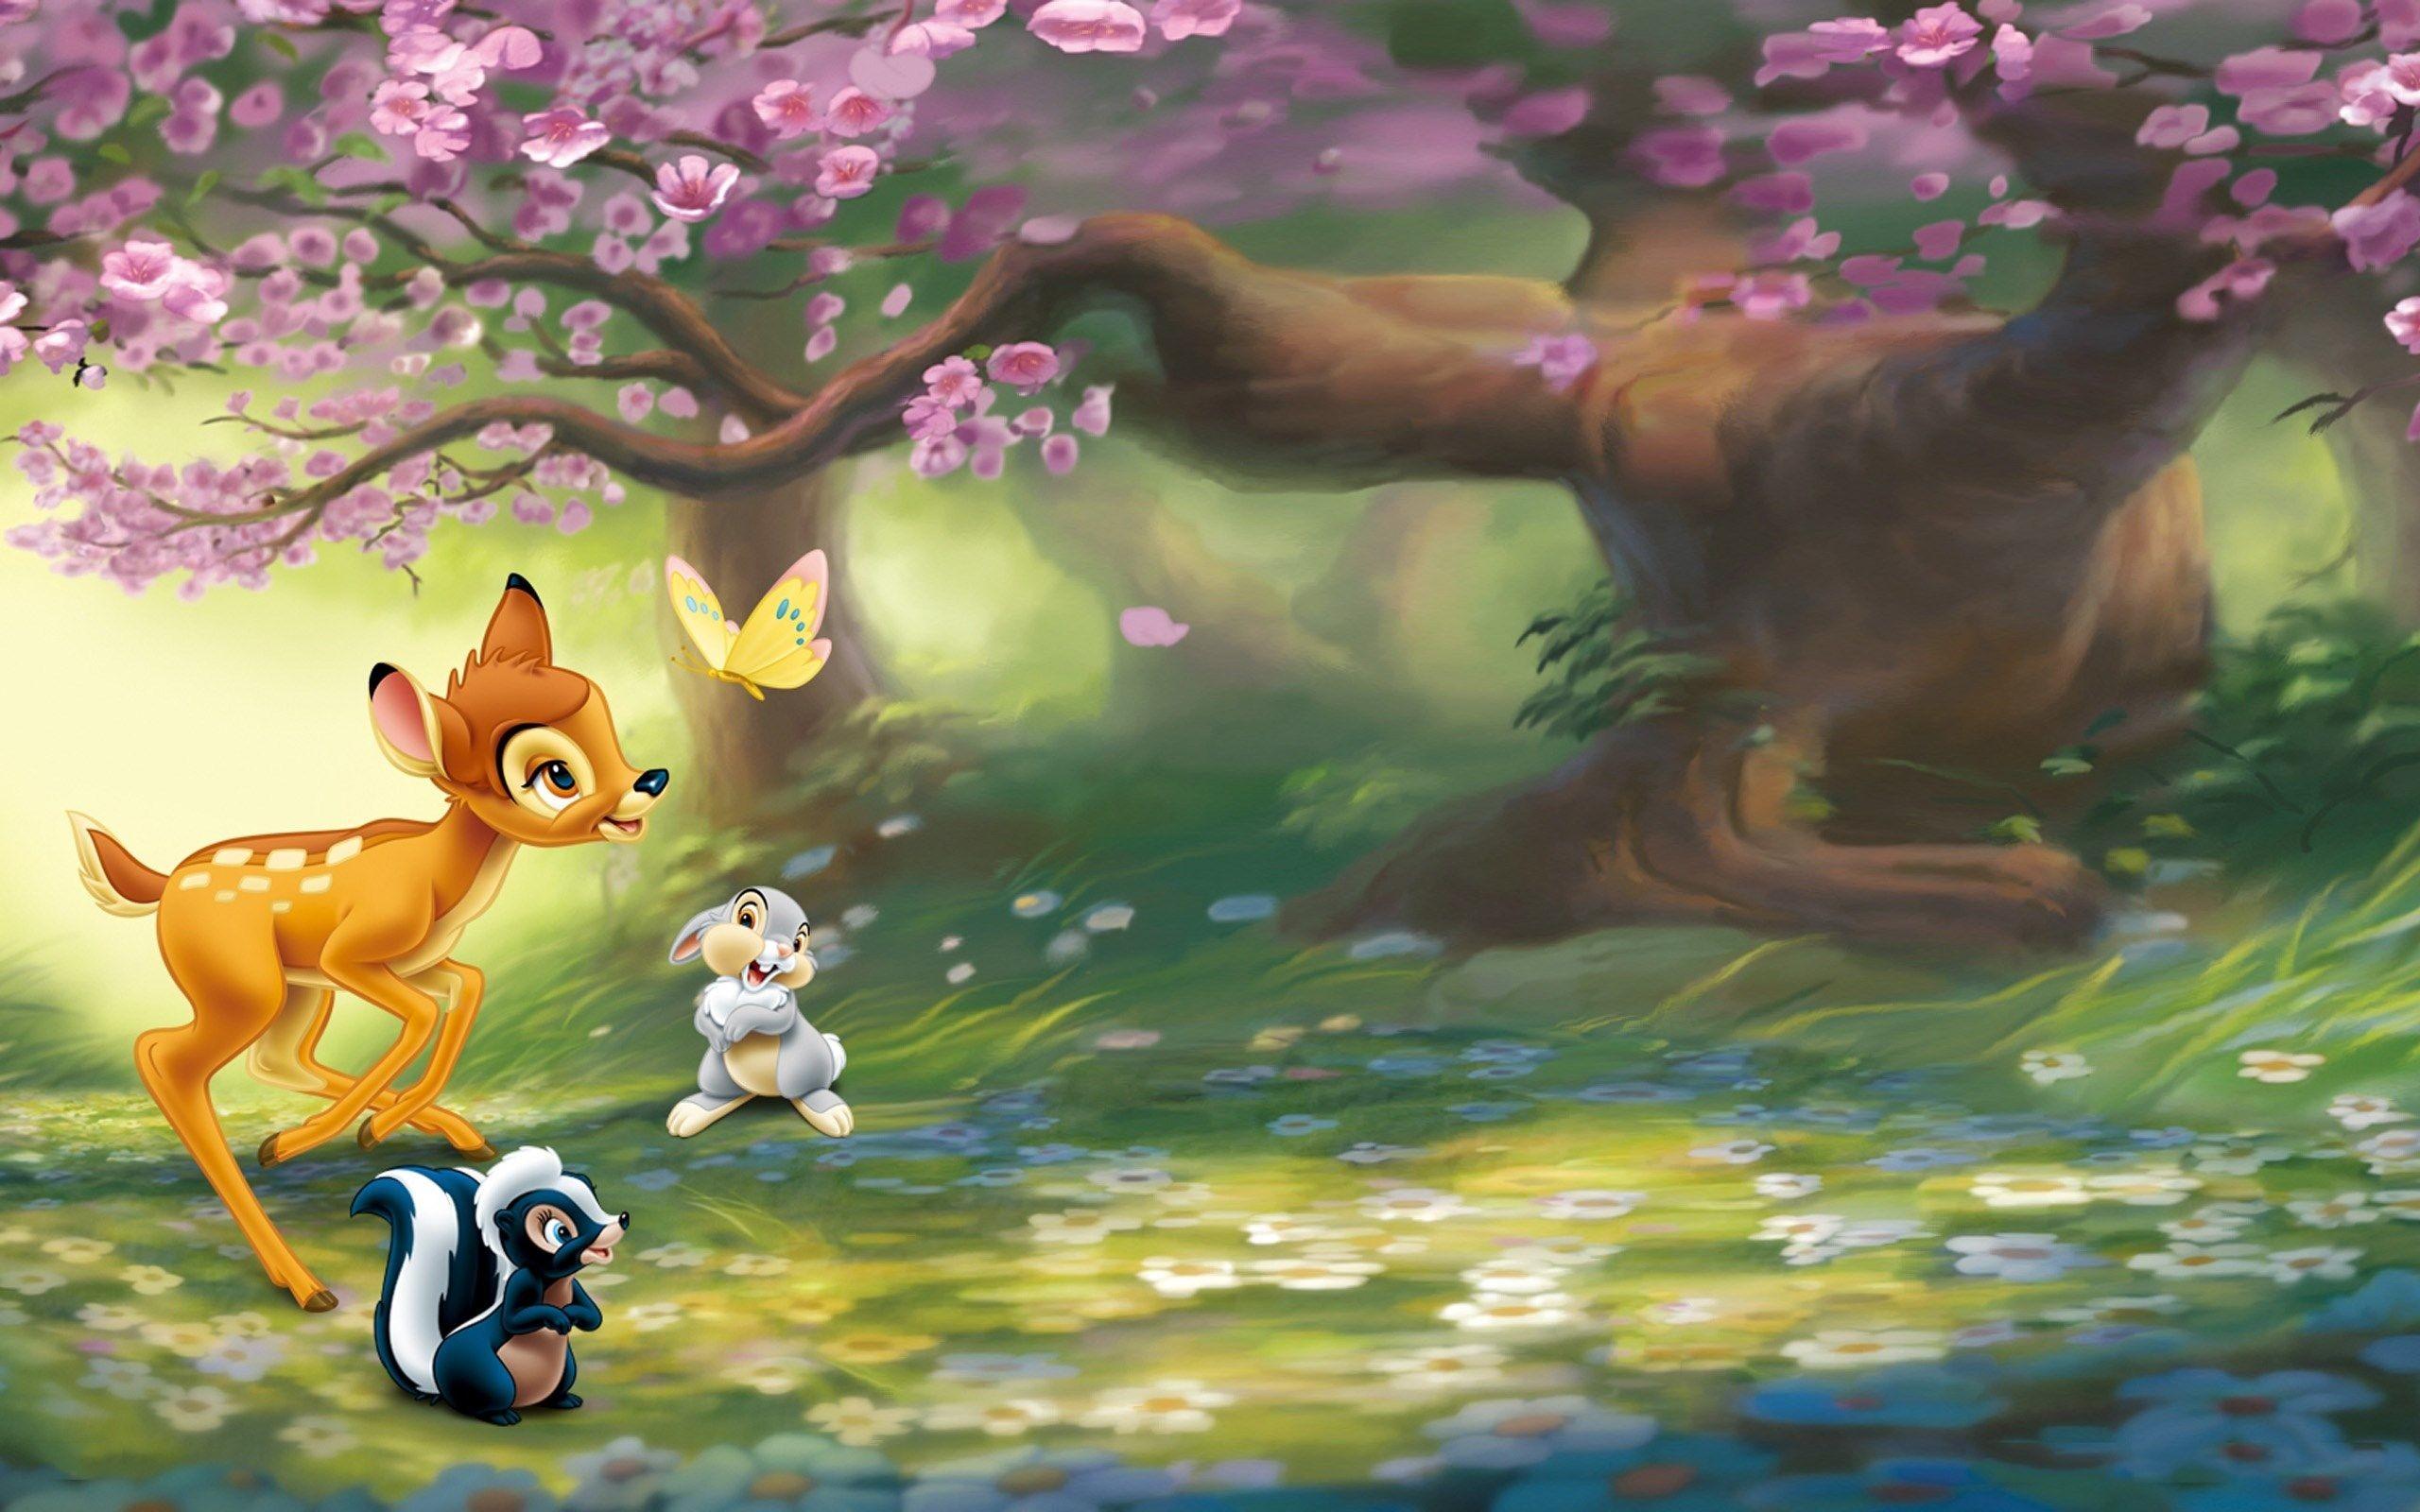 Res: 2560x1600, Disney Cartoon Full HD Wallpaper - Download Wallpapers In HD .